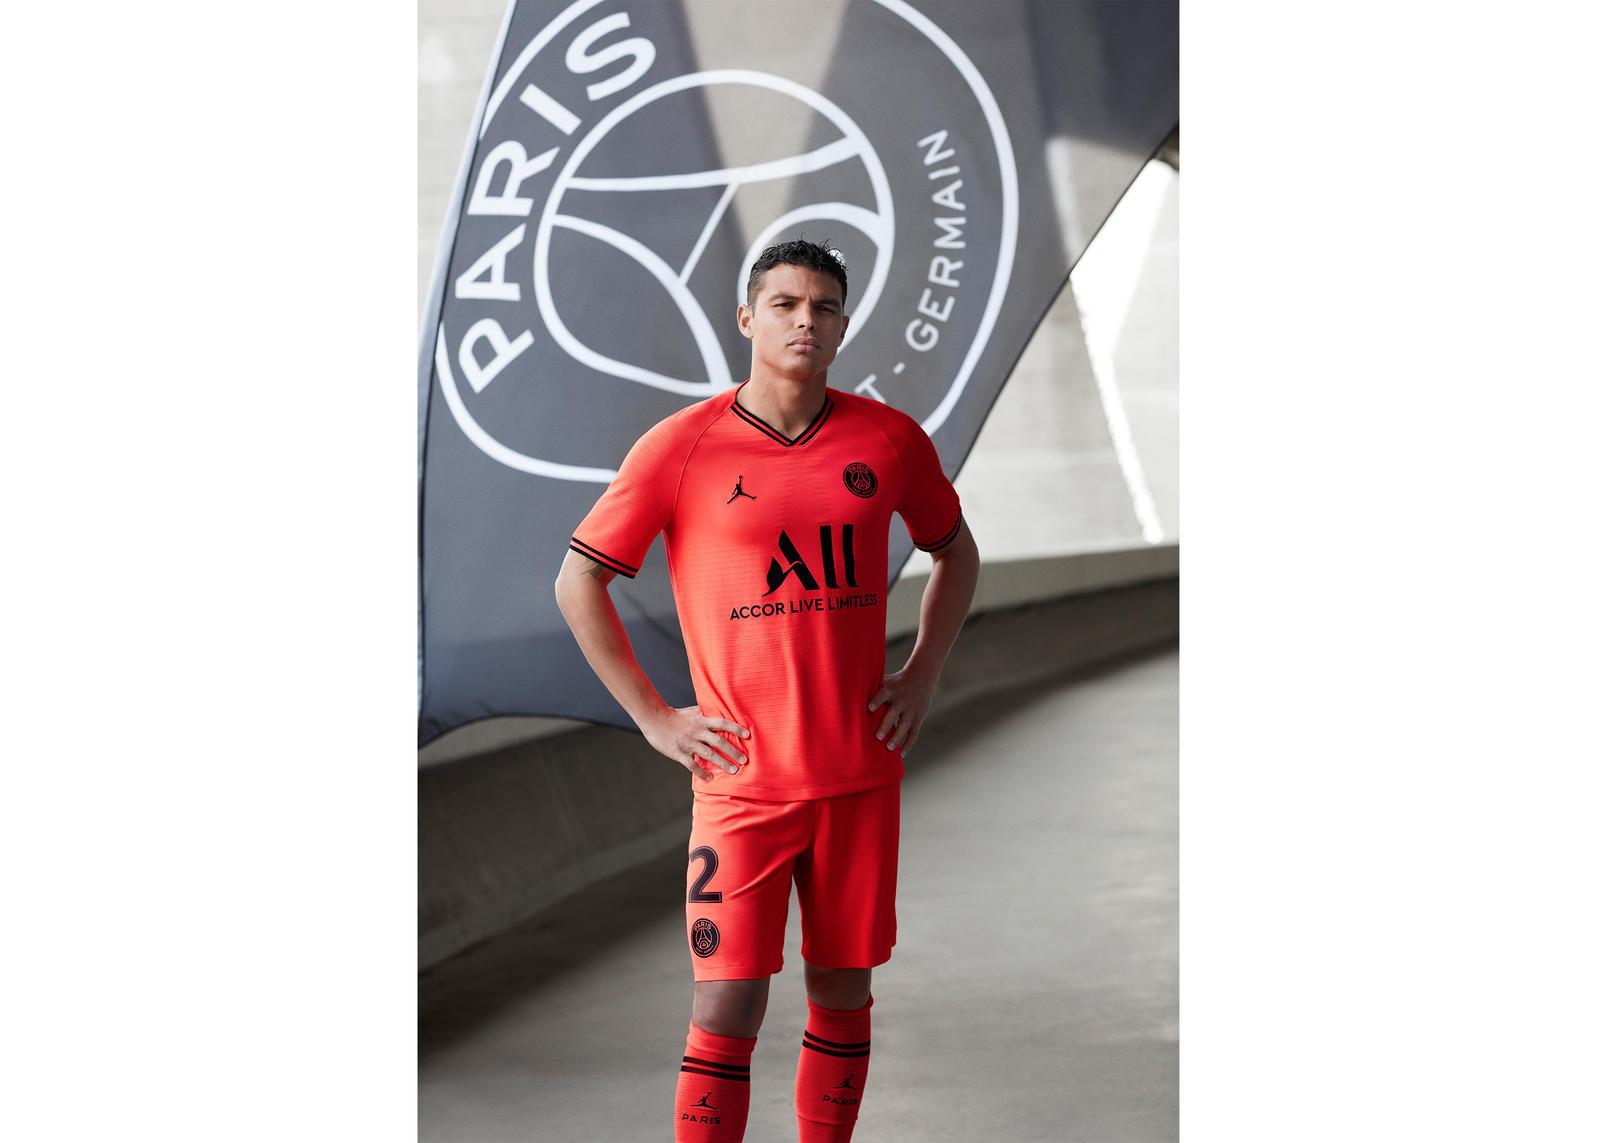 Jordan Brand Paris Saint-Germain Away Kit 2019-20 - Nike News